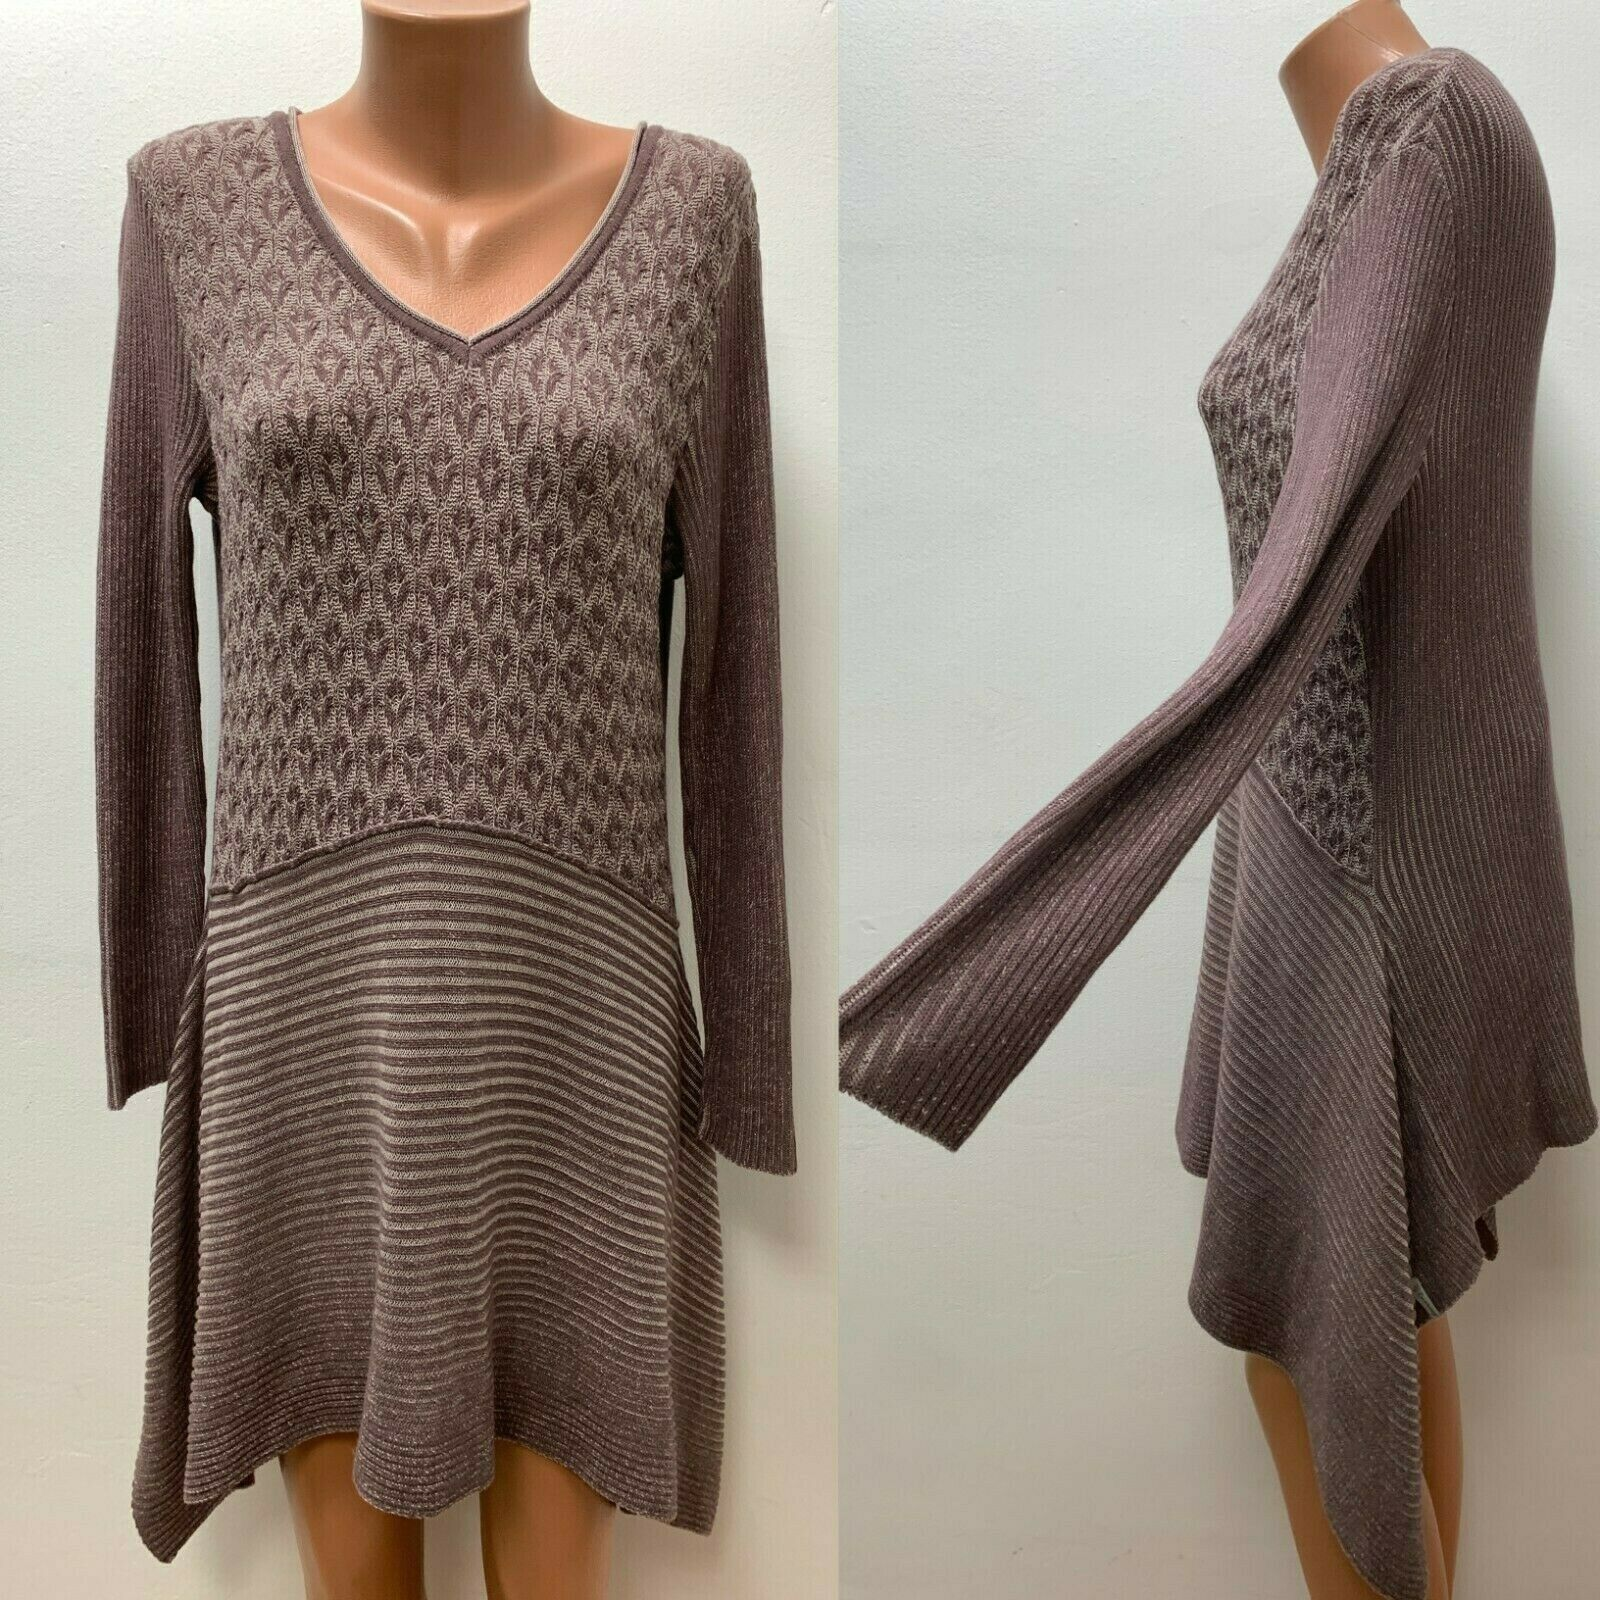 DEERBERG Gr.L Kleid Strickkleid Asymmetrisch Braun